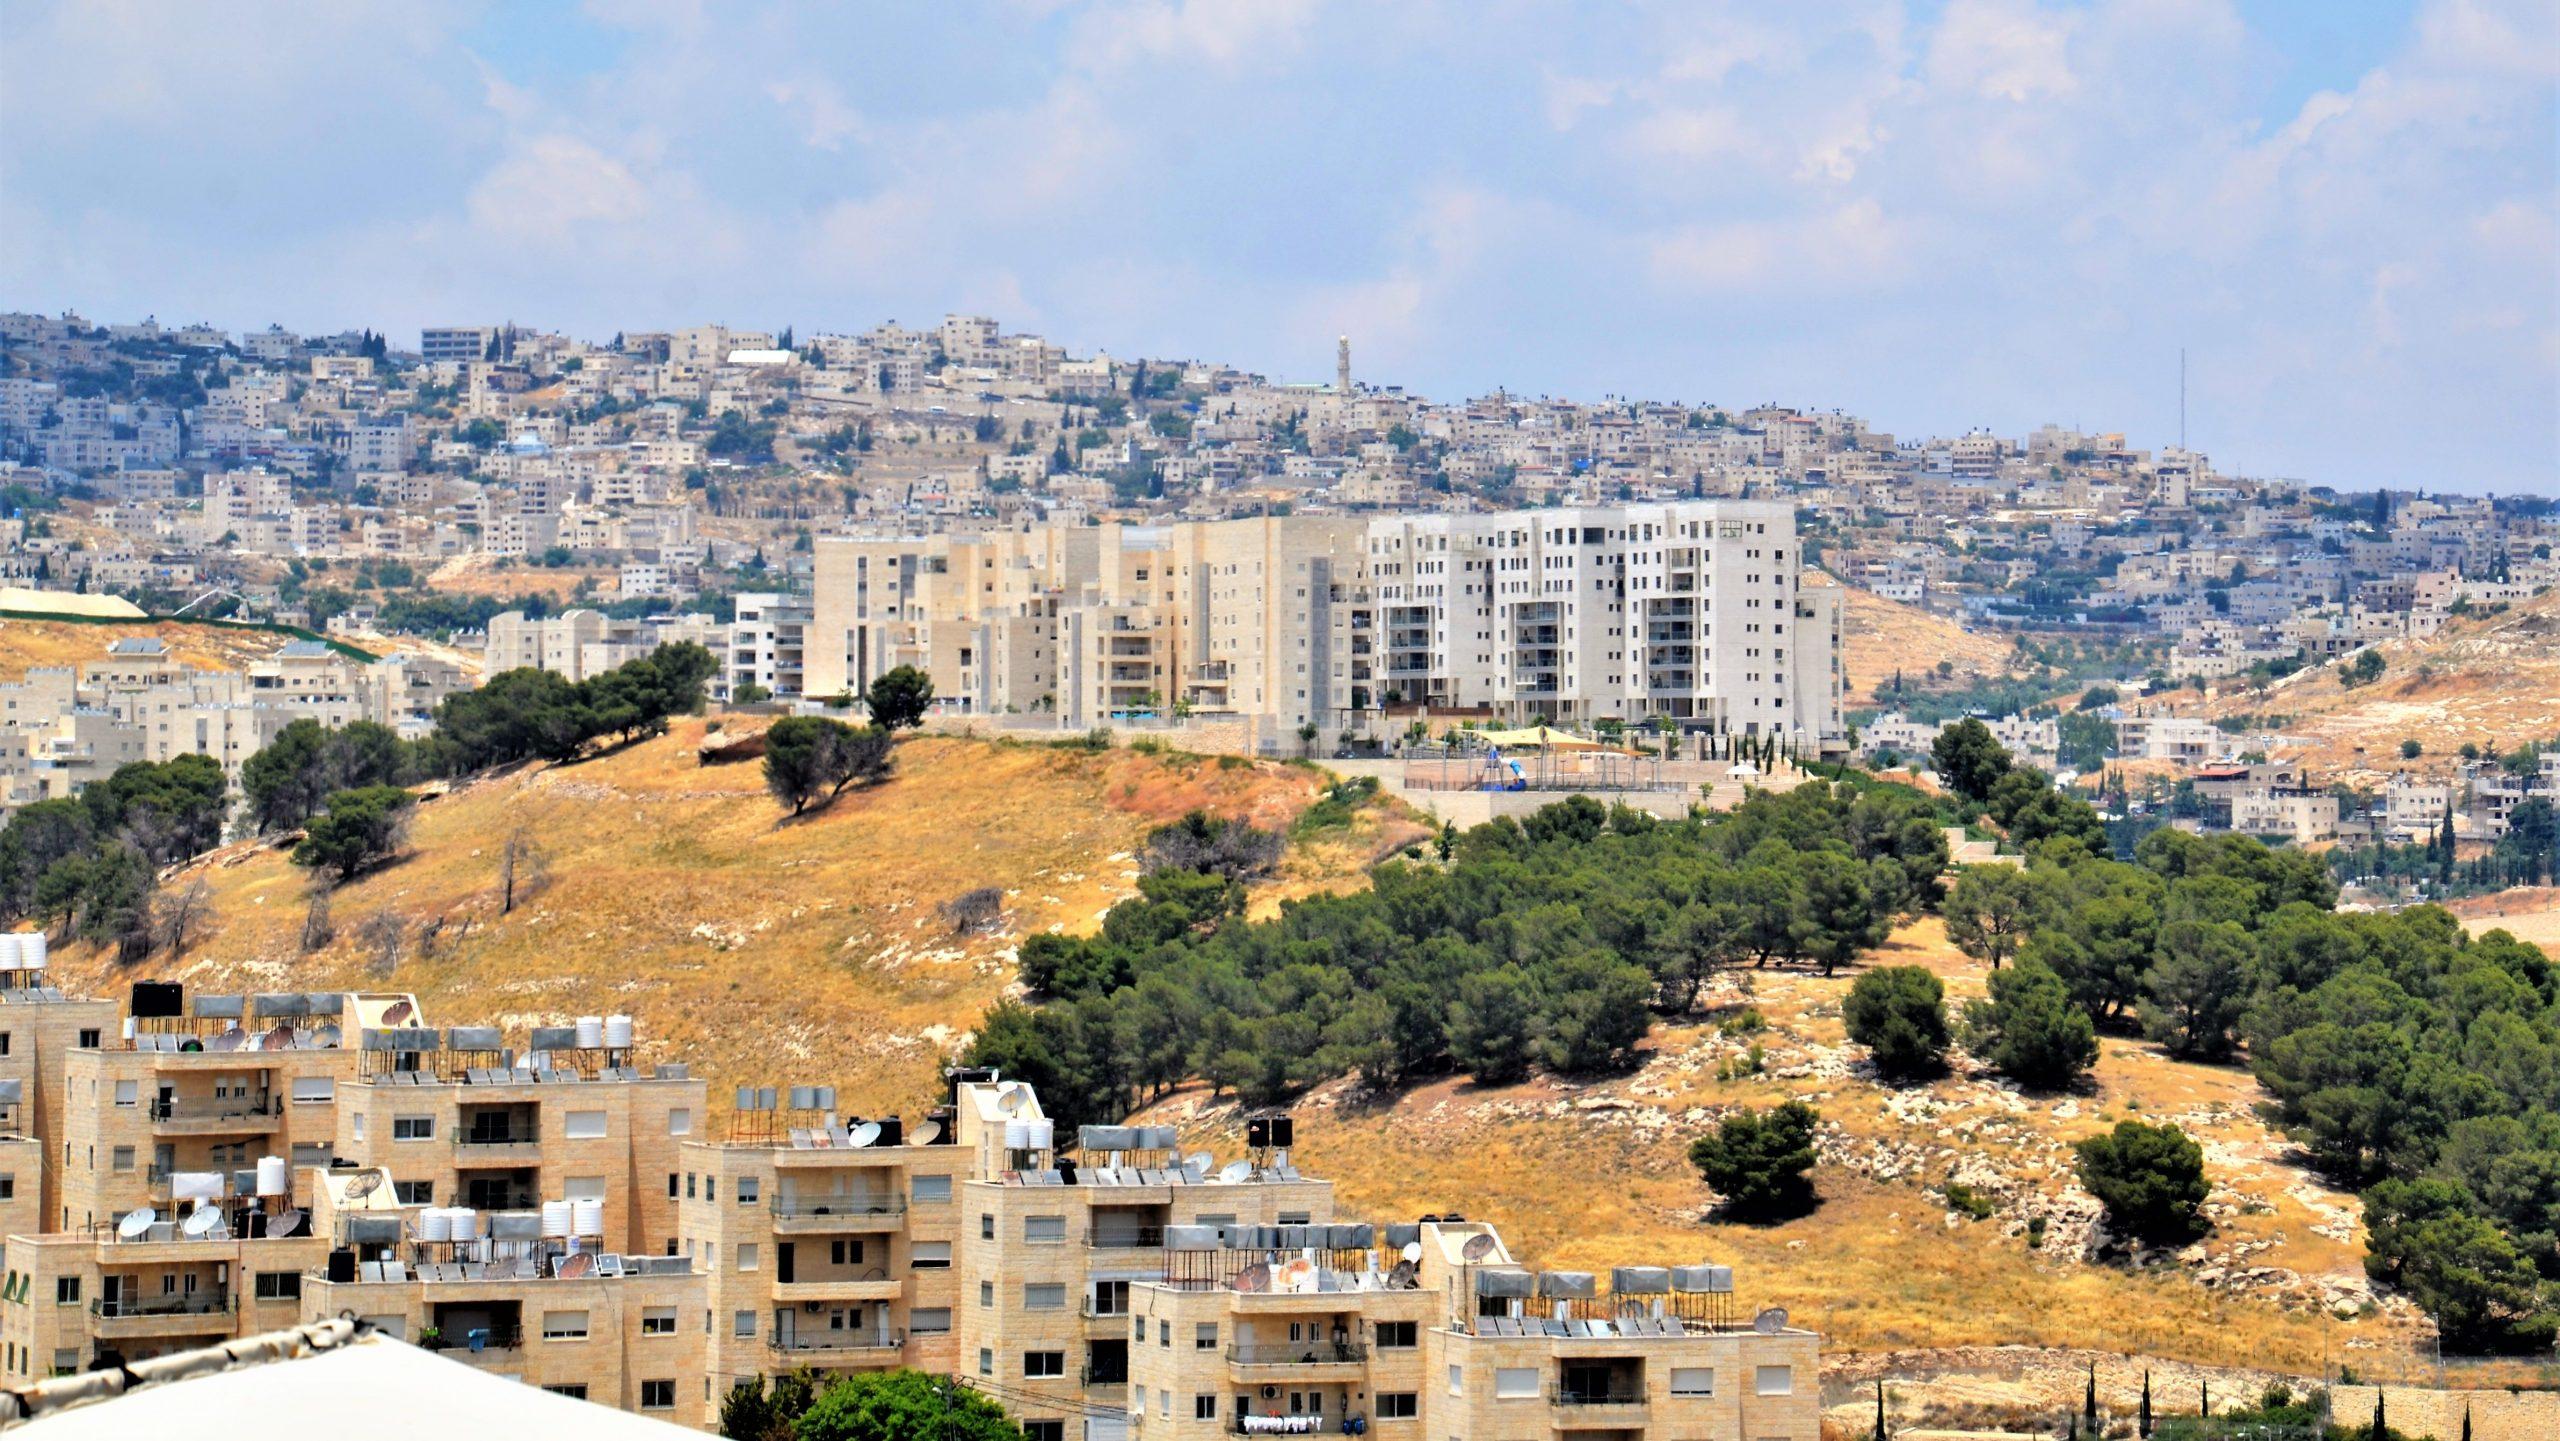 Hirtenfelder: Blick auf Betlehem